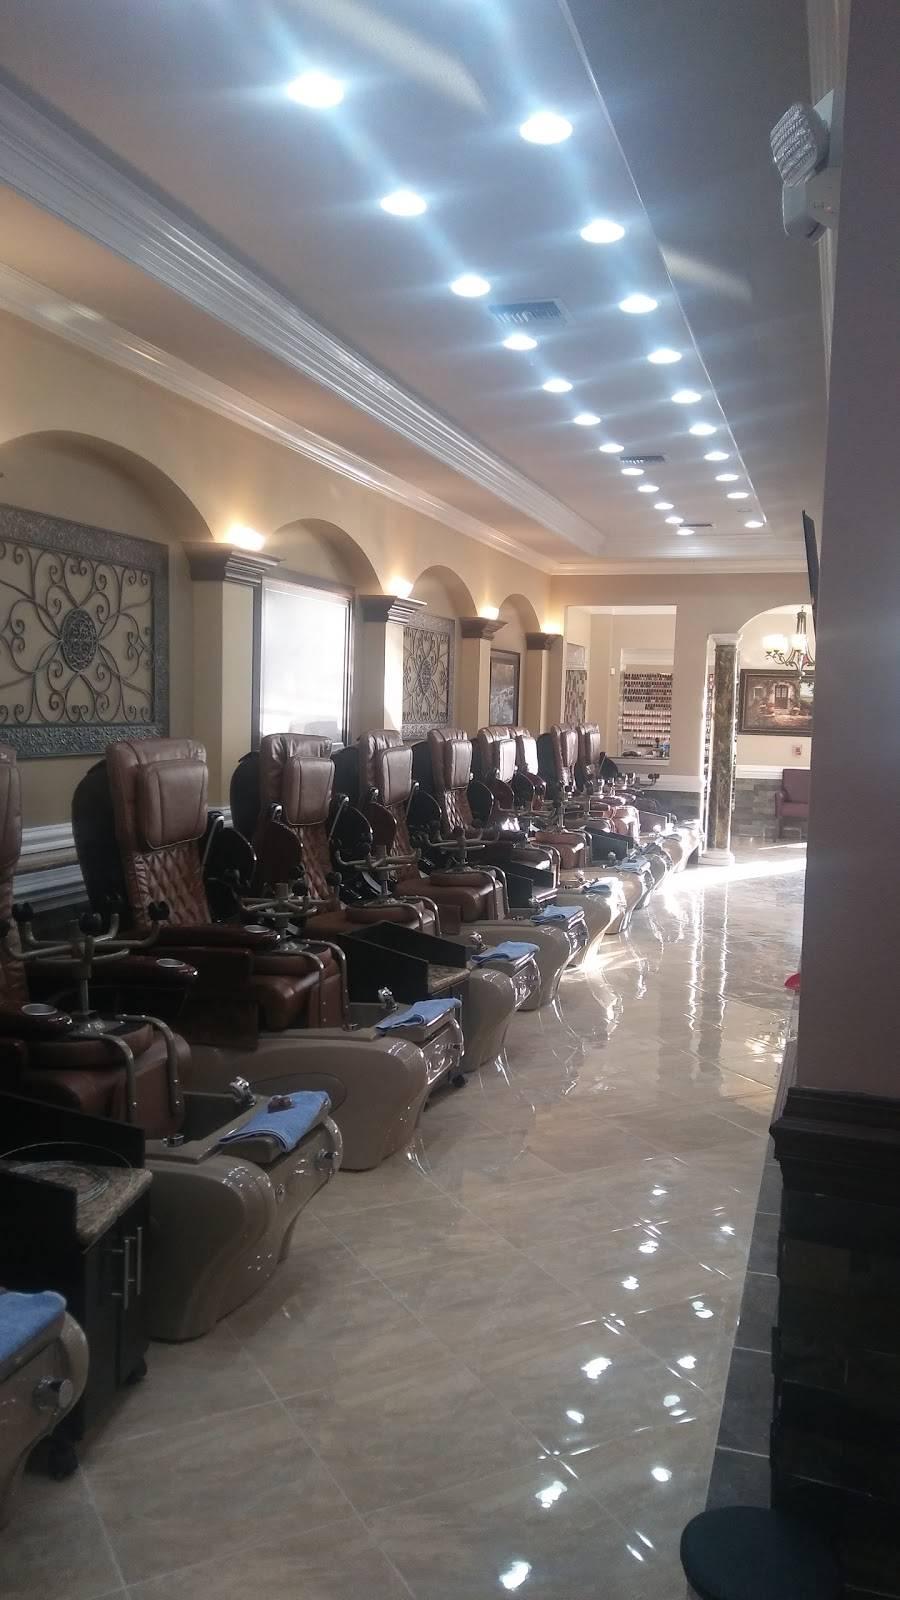 La Nails & Hair - hair care    Photo 10 of 10   Address: 5796 Crowder Blvd, New Orleans, LA 70127, USA   Phone: (504) 513-2754